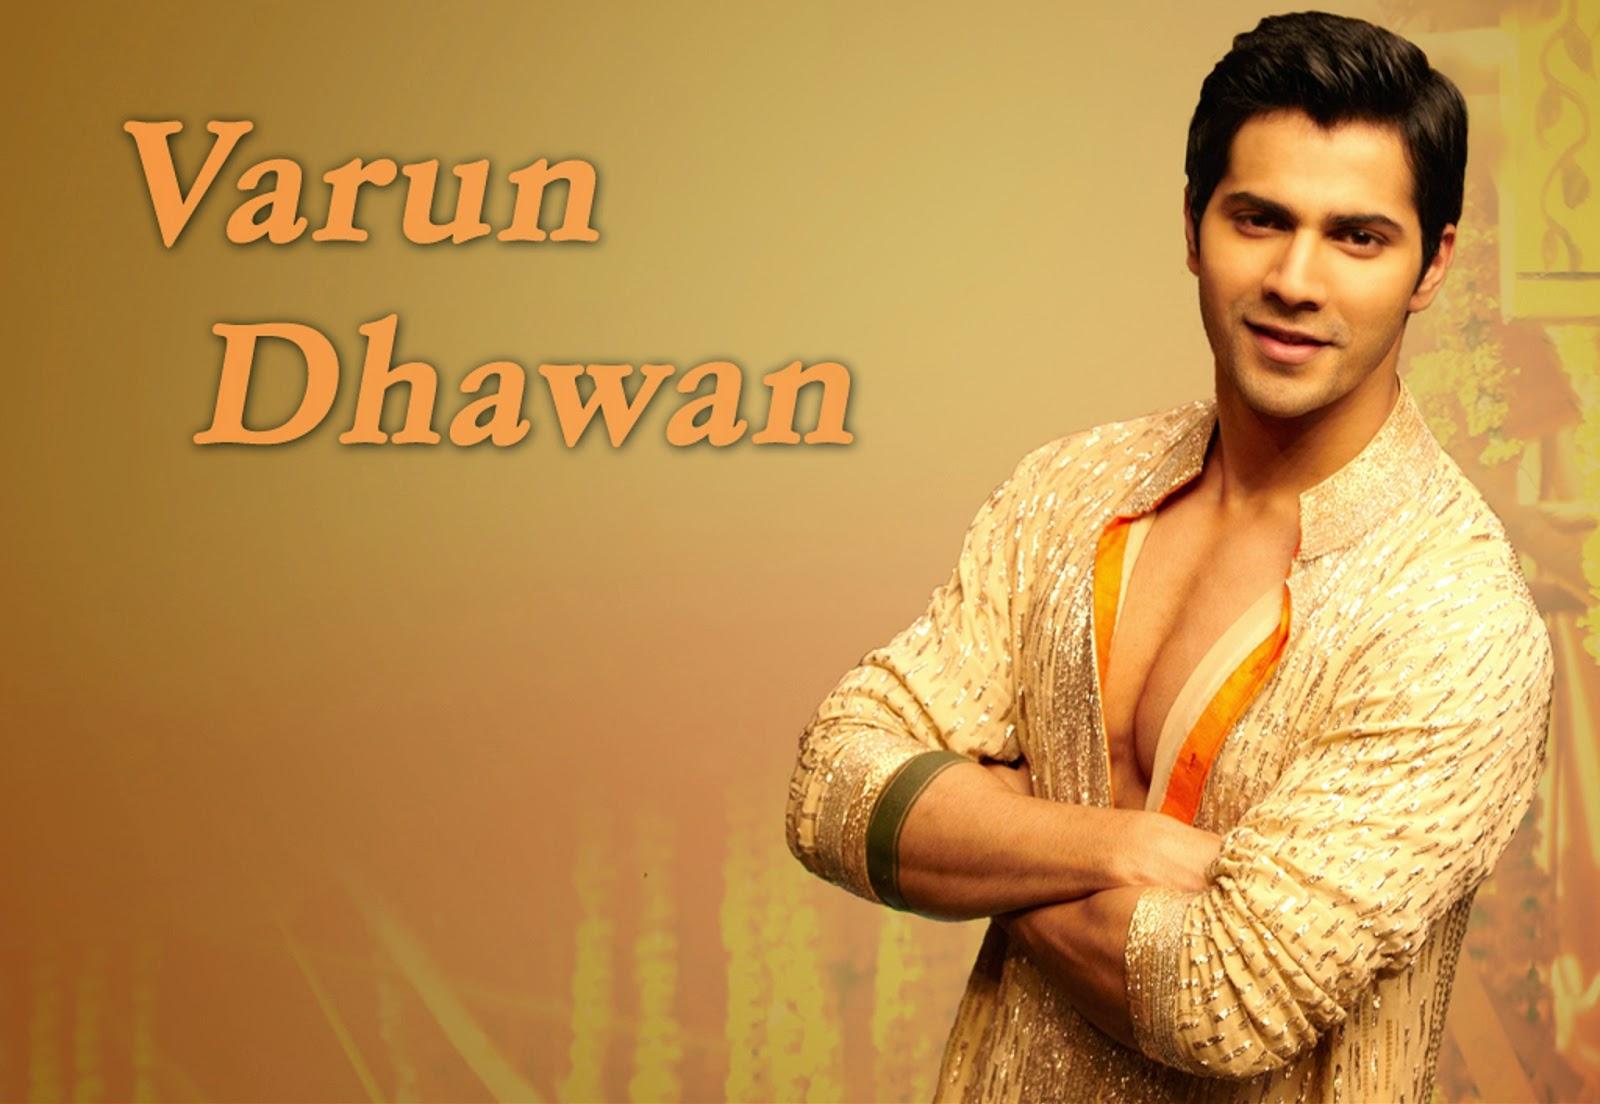 Varun Dhawan Wallpapers Free Download